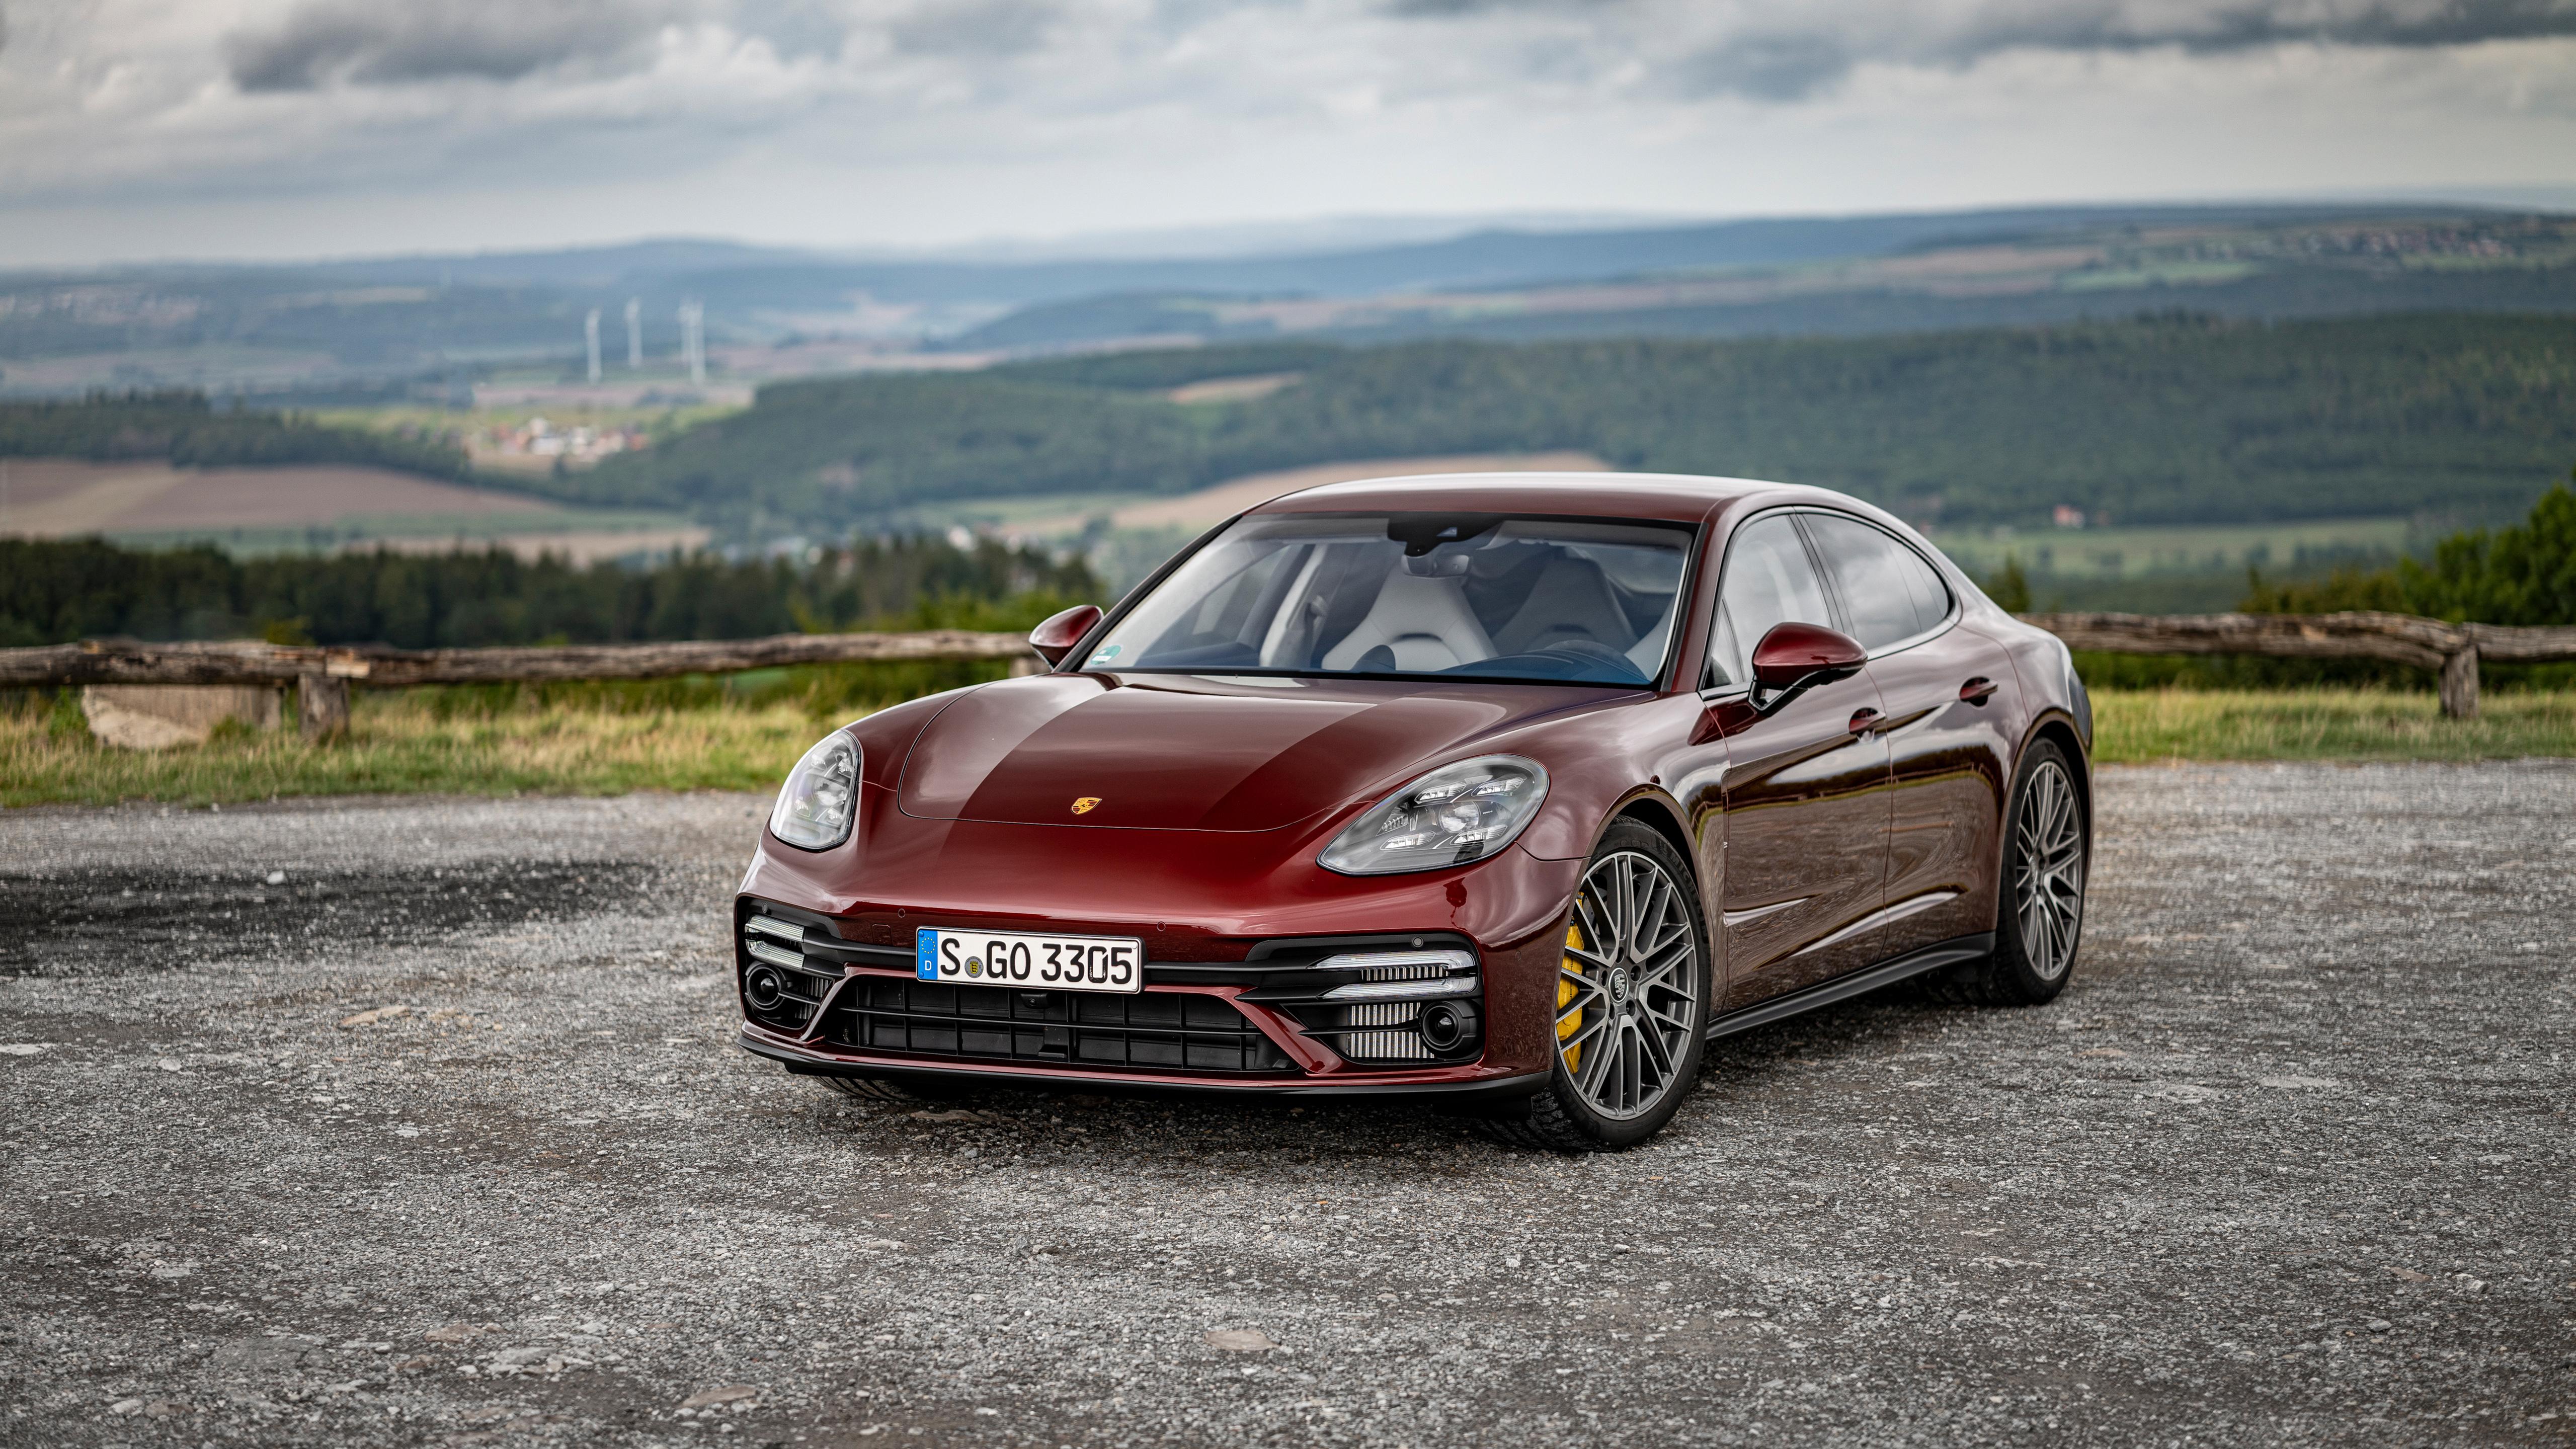 Porsche Panamera Turbo S 2020 5k Wallpaper Hd Car Wallpapers Id 15659